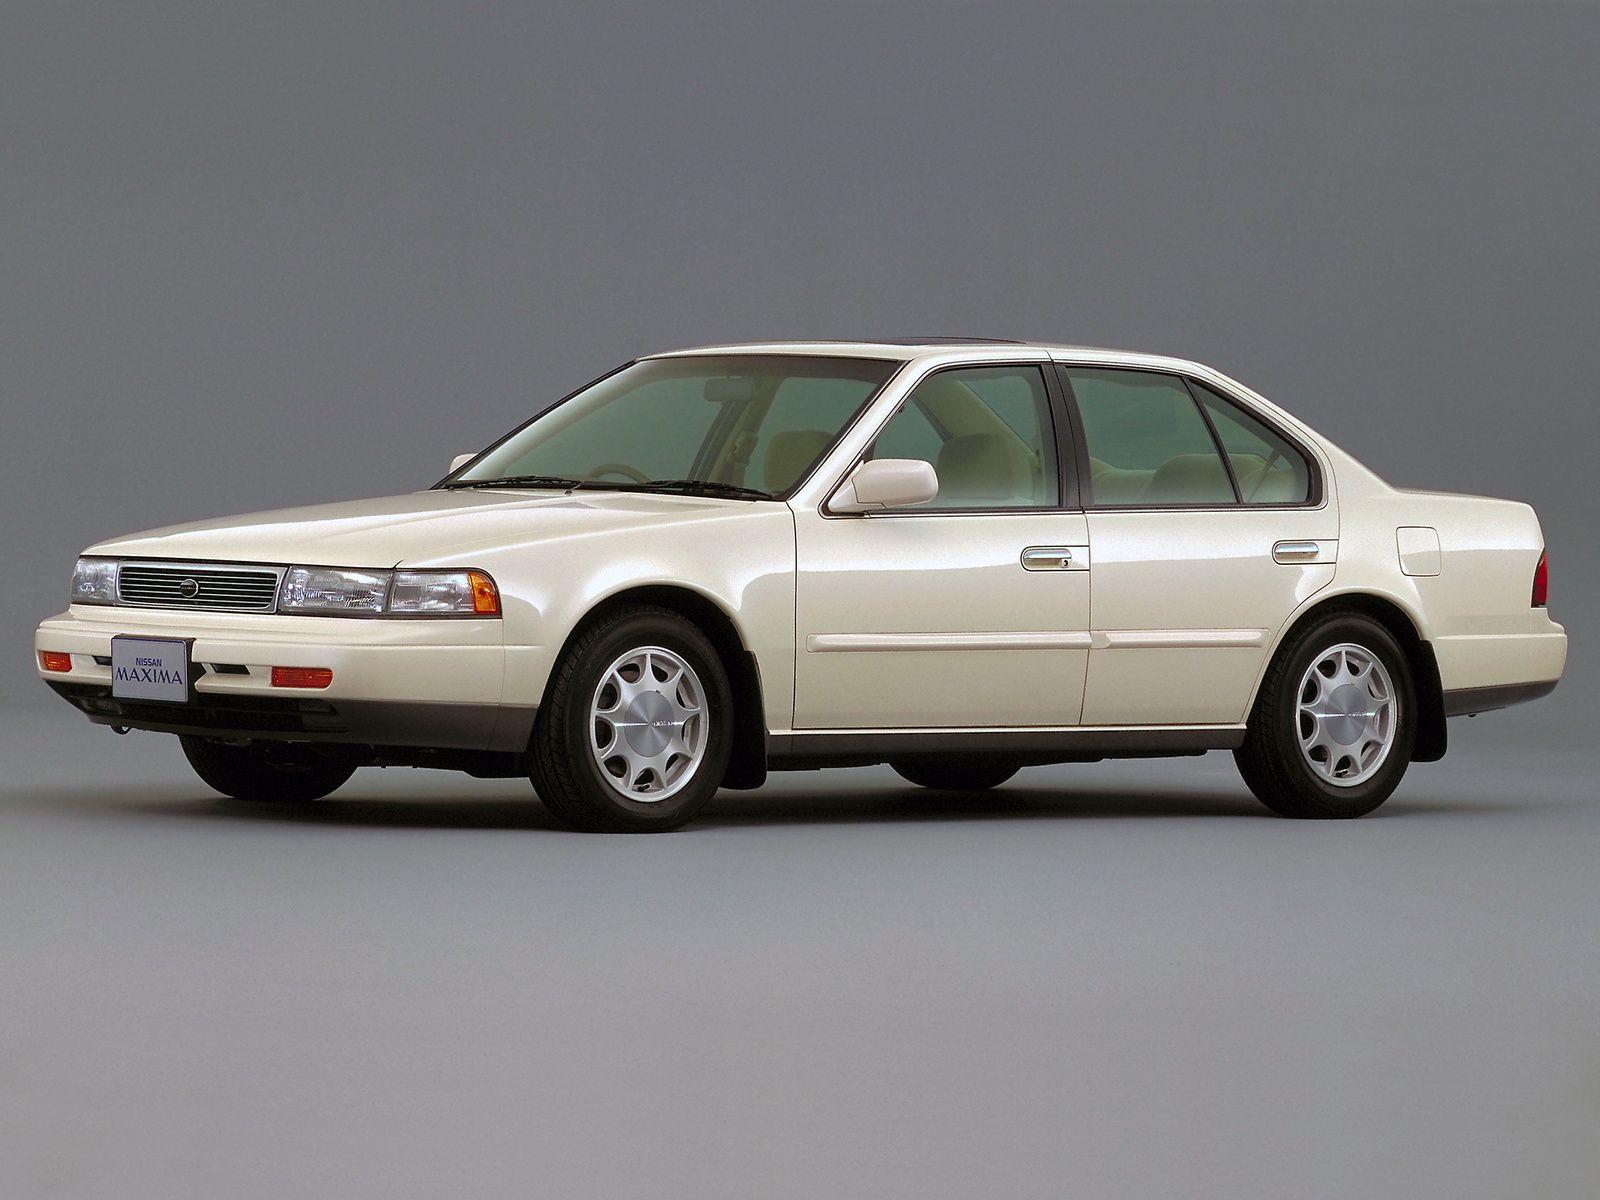 1992 Nissan Maxima Repair Manual